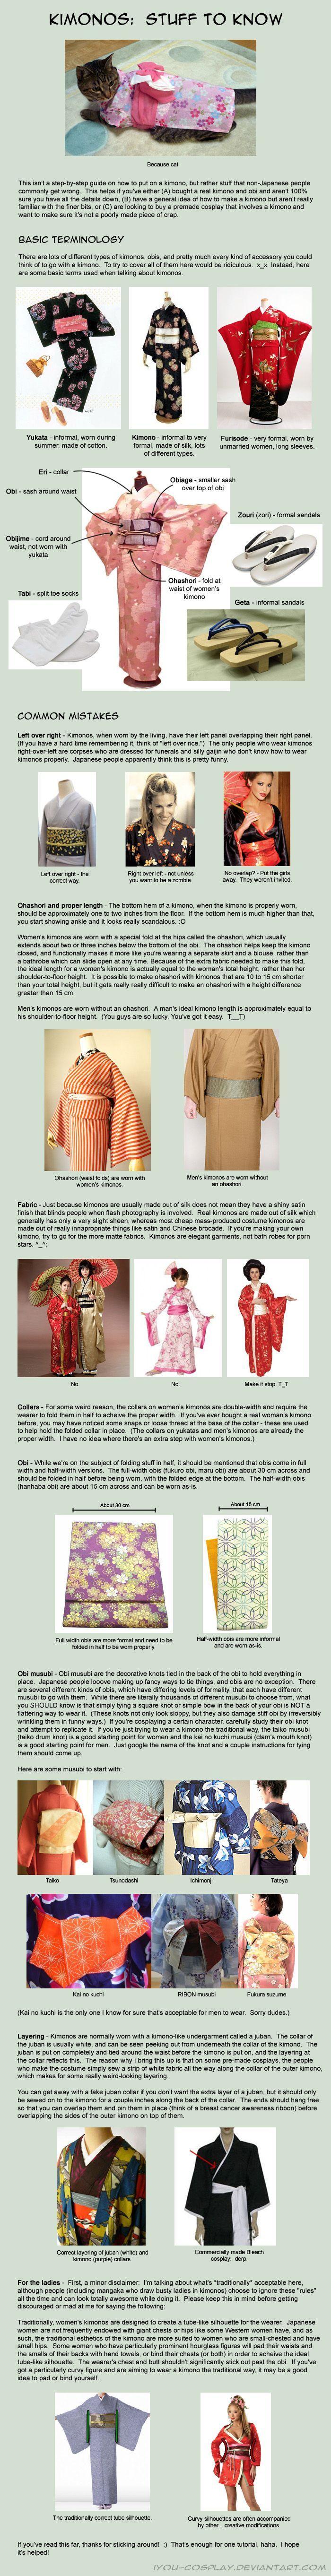 Kimonos:  Stuff to Know by iyou-cosplay.deviantart.com on @deviantART